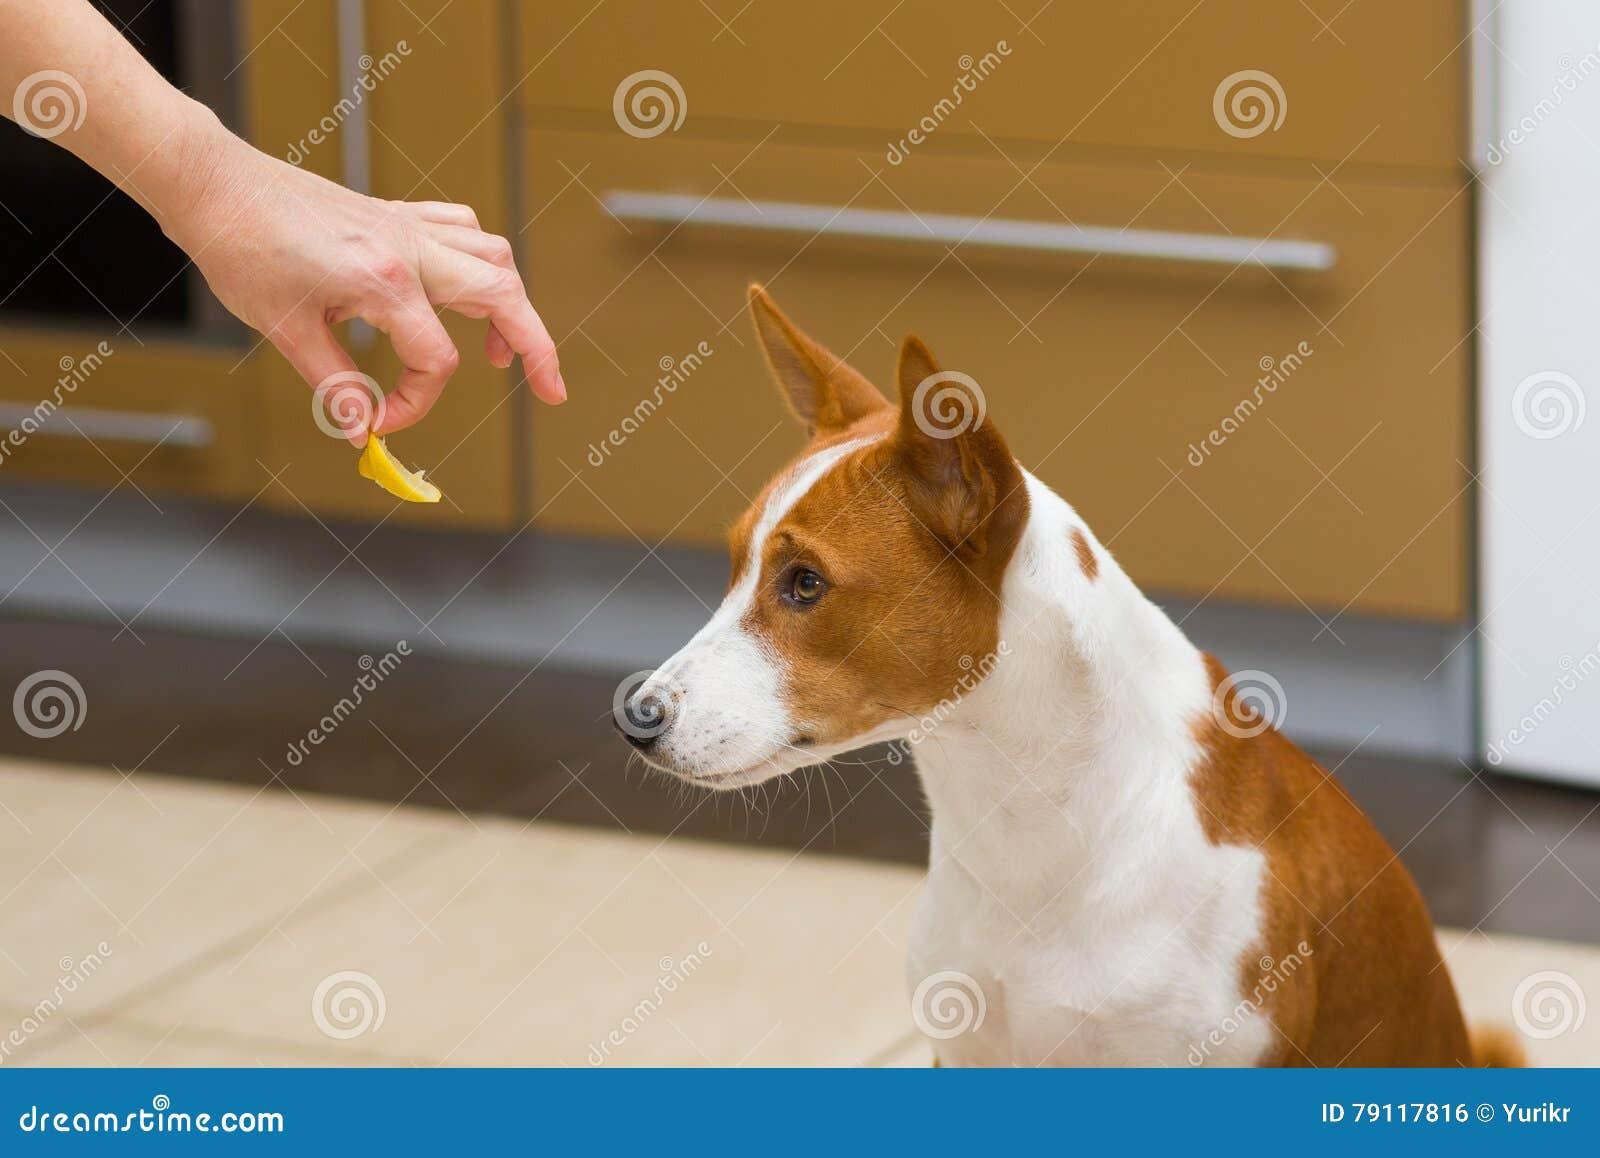 Basenji dog doesn t want to eat lemon - this is strange human food